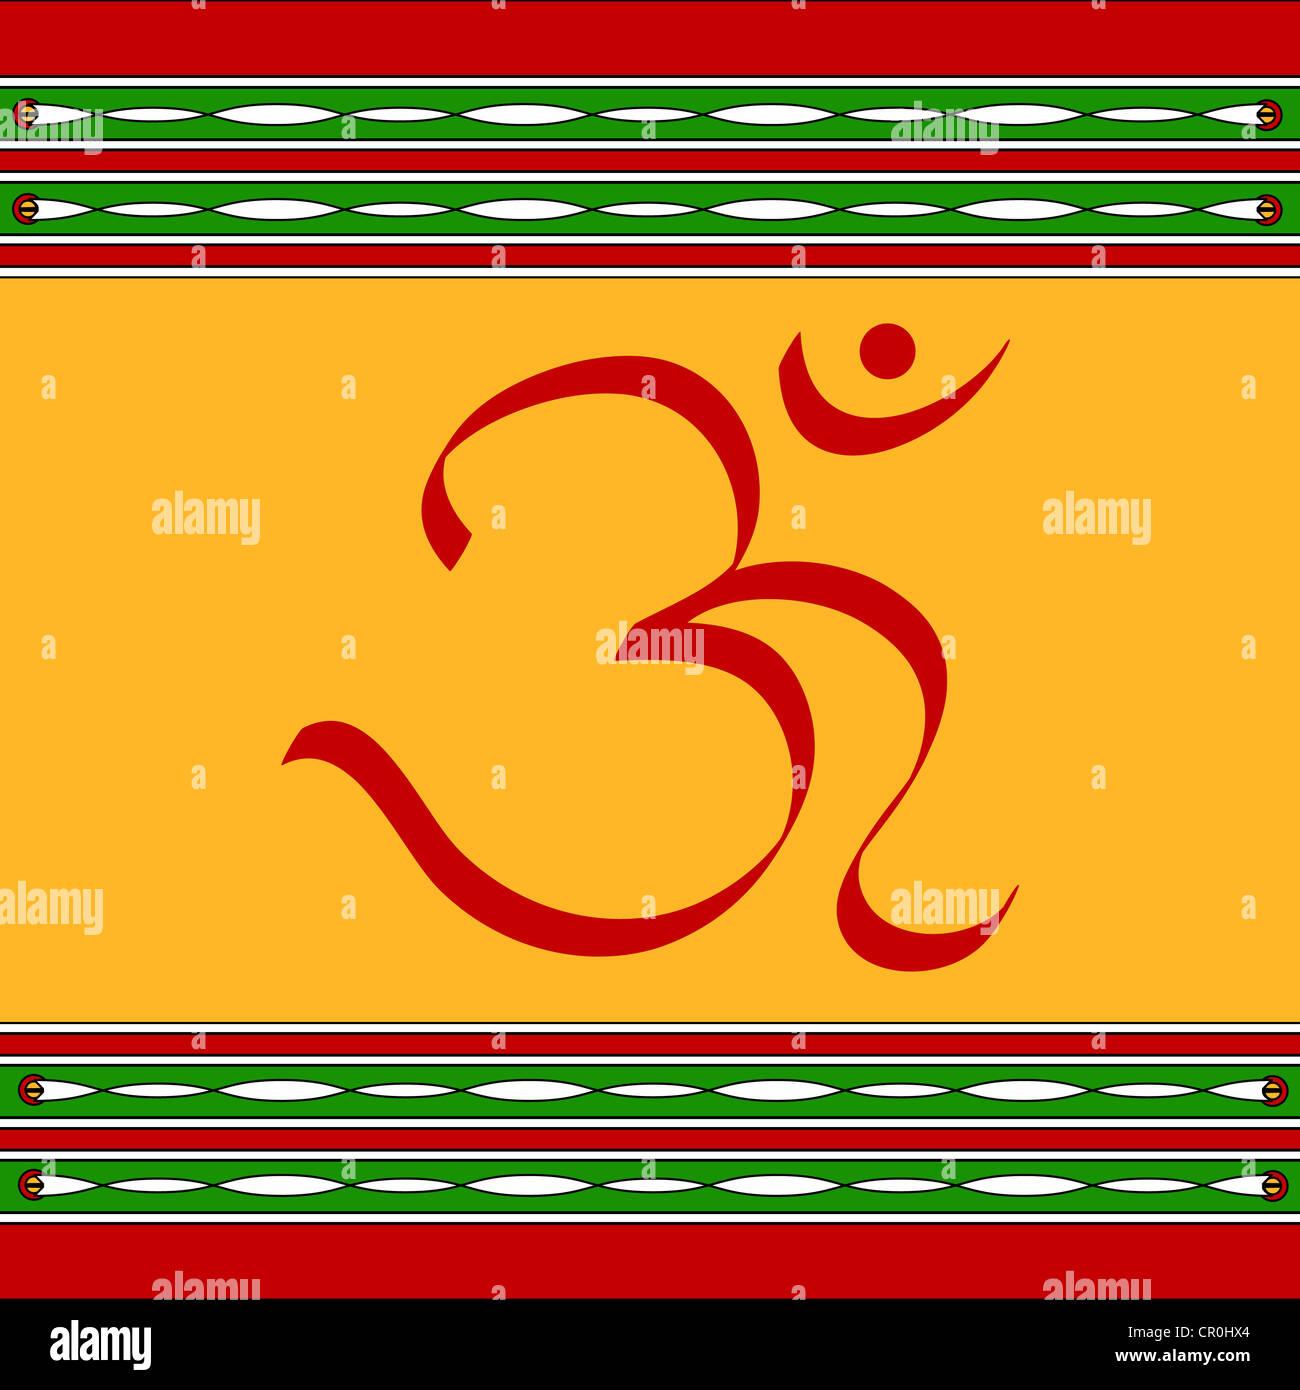 Divine OM symbol with artistic border - Stock Image